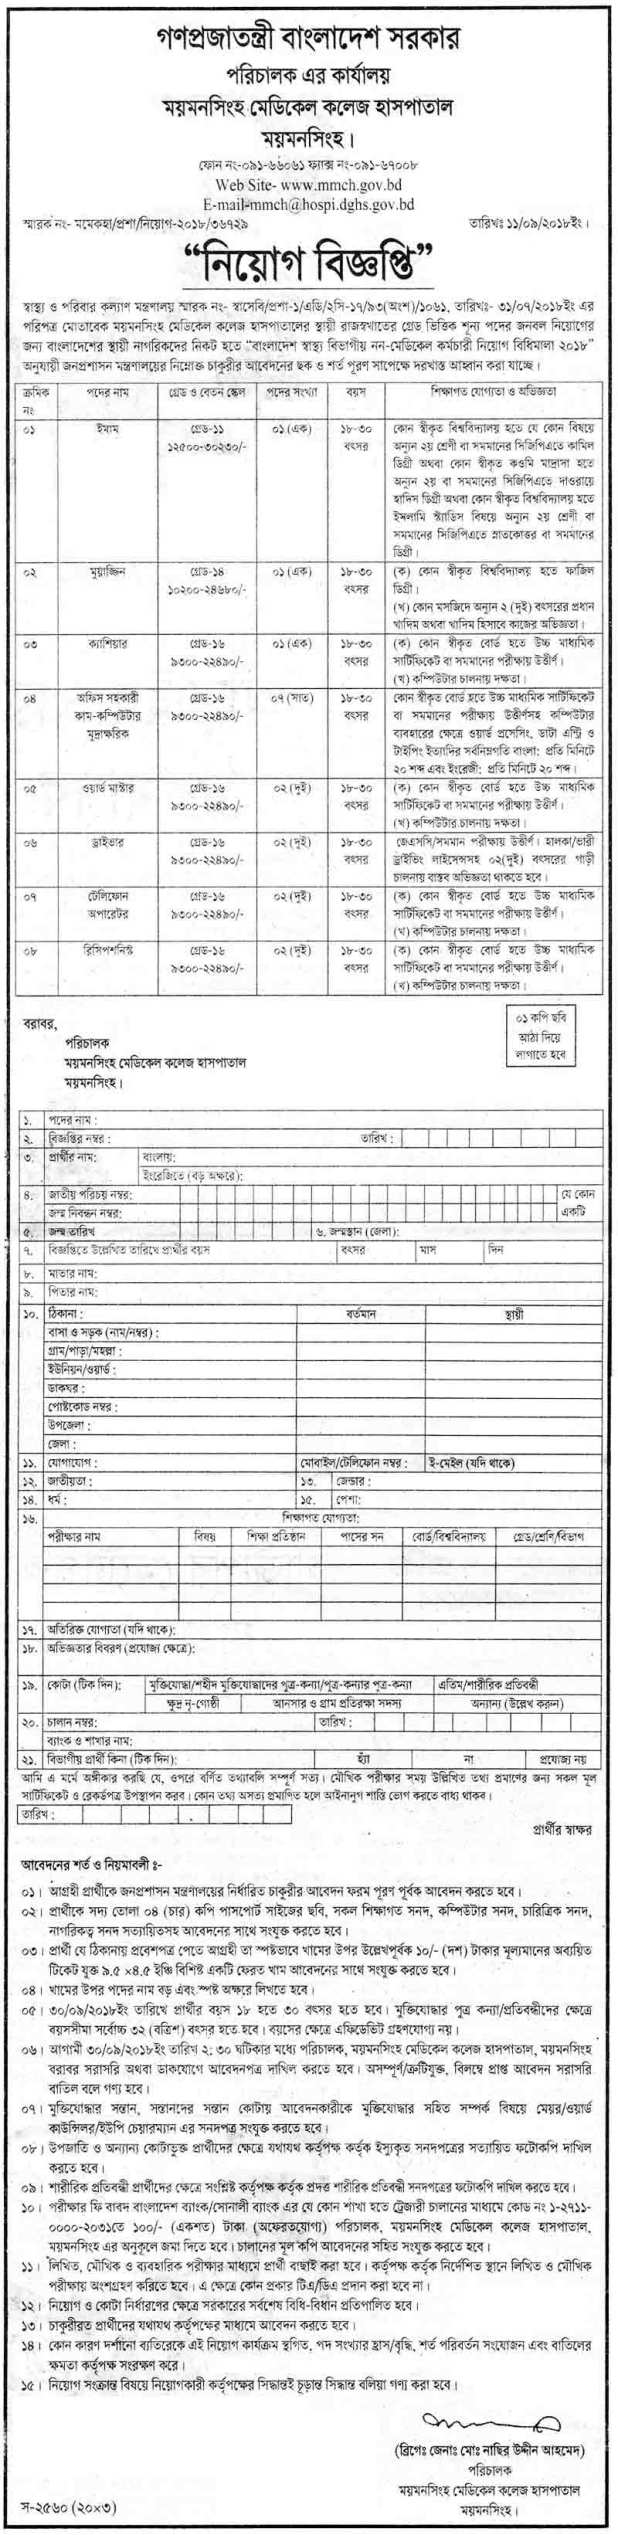 Mymensingh Medical College Hospital job circular 2018